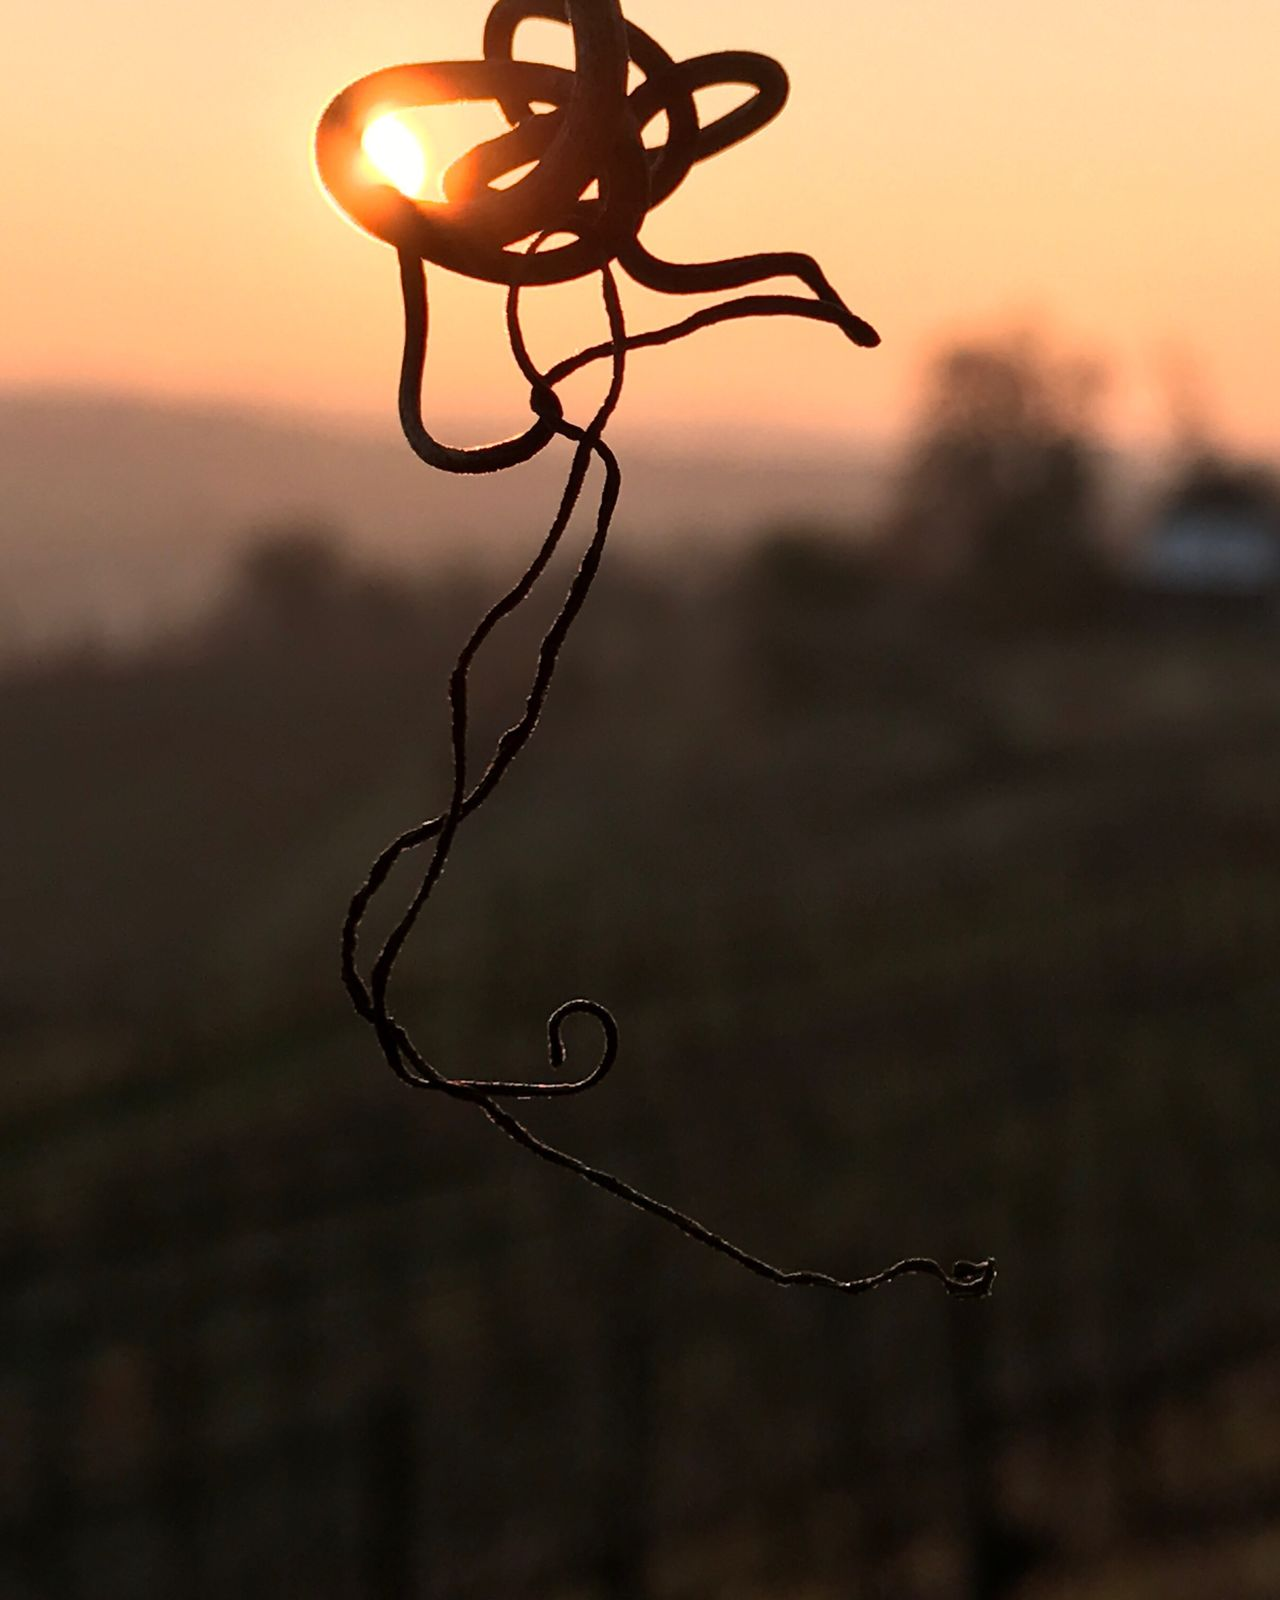 Vignes Jurançon Monein Sunset No People Nature Outdoors Beauty In Nature